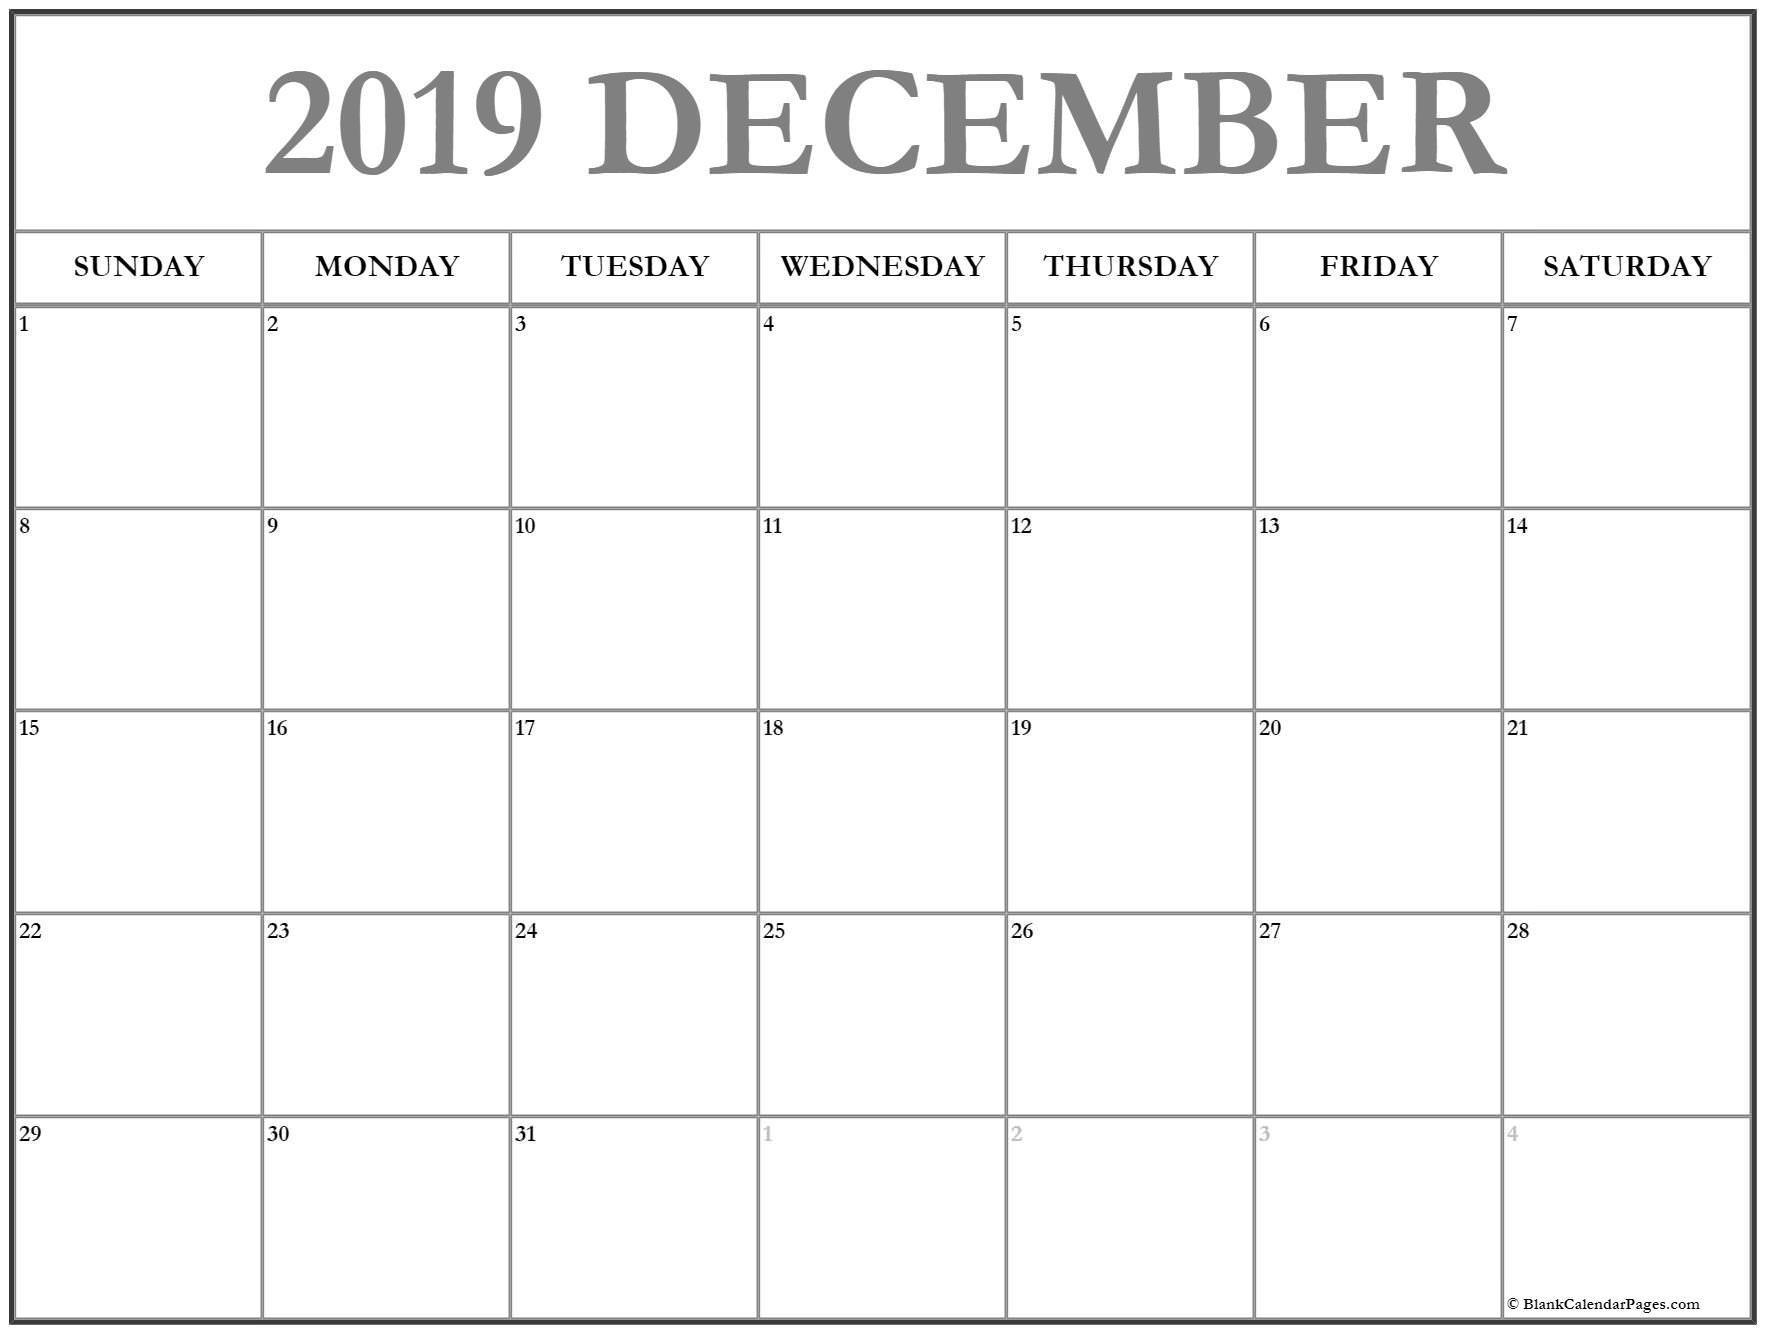 December 2019 Calendar | 56+ Templates Of 2019 Printable Calendars Calendar 2019 November December